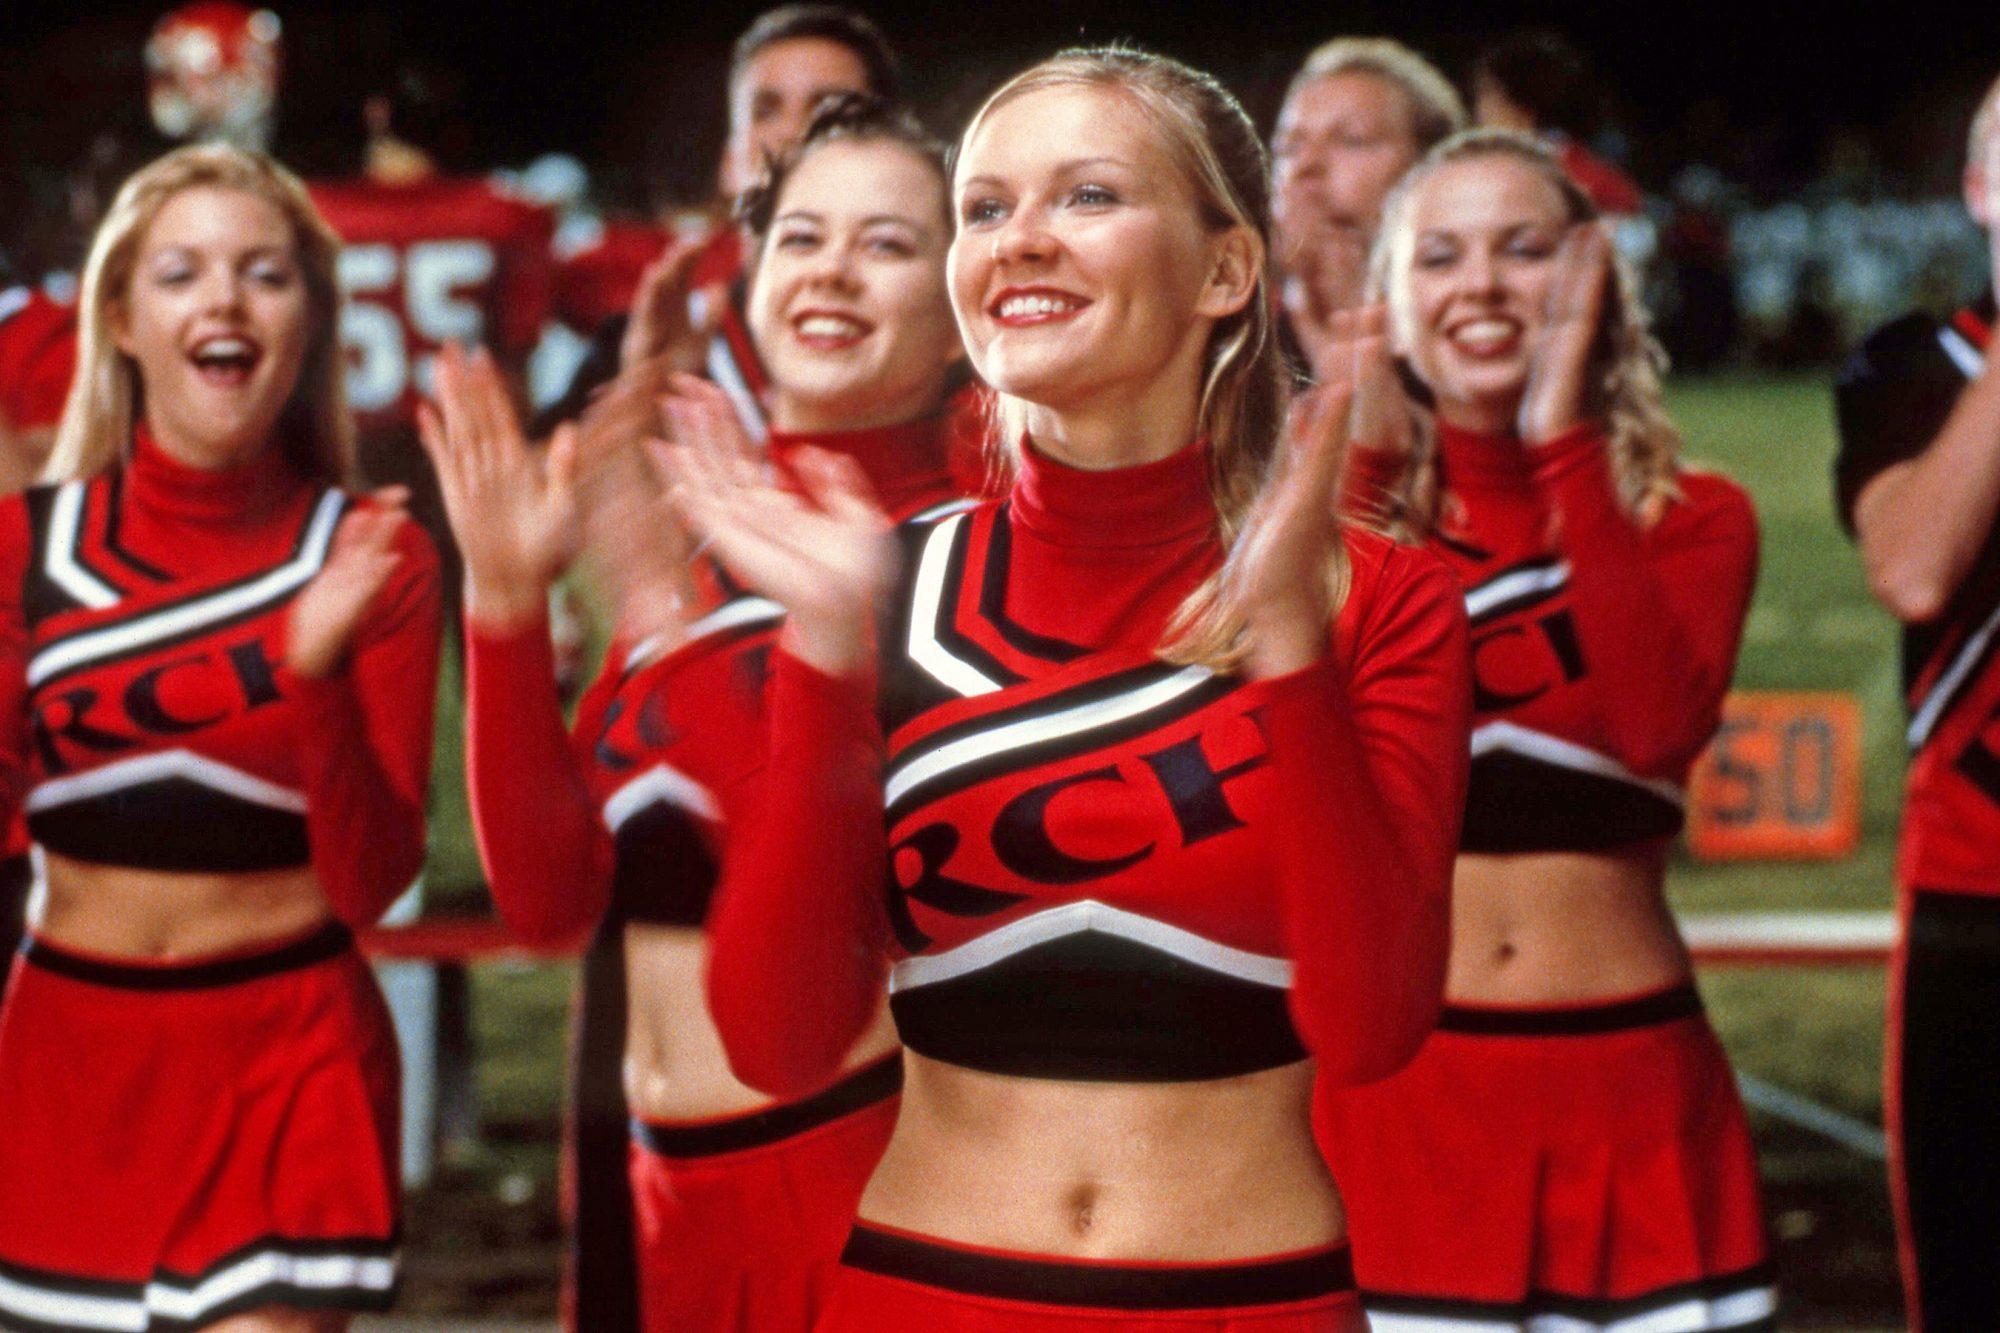 Bring It On (2000)Kirsten Dunst